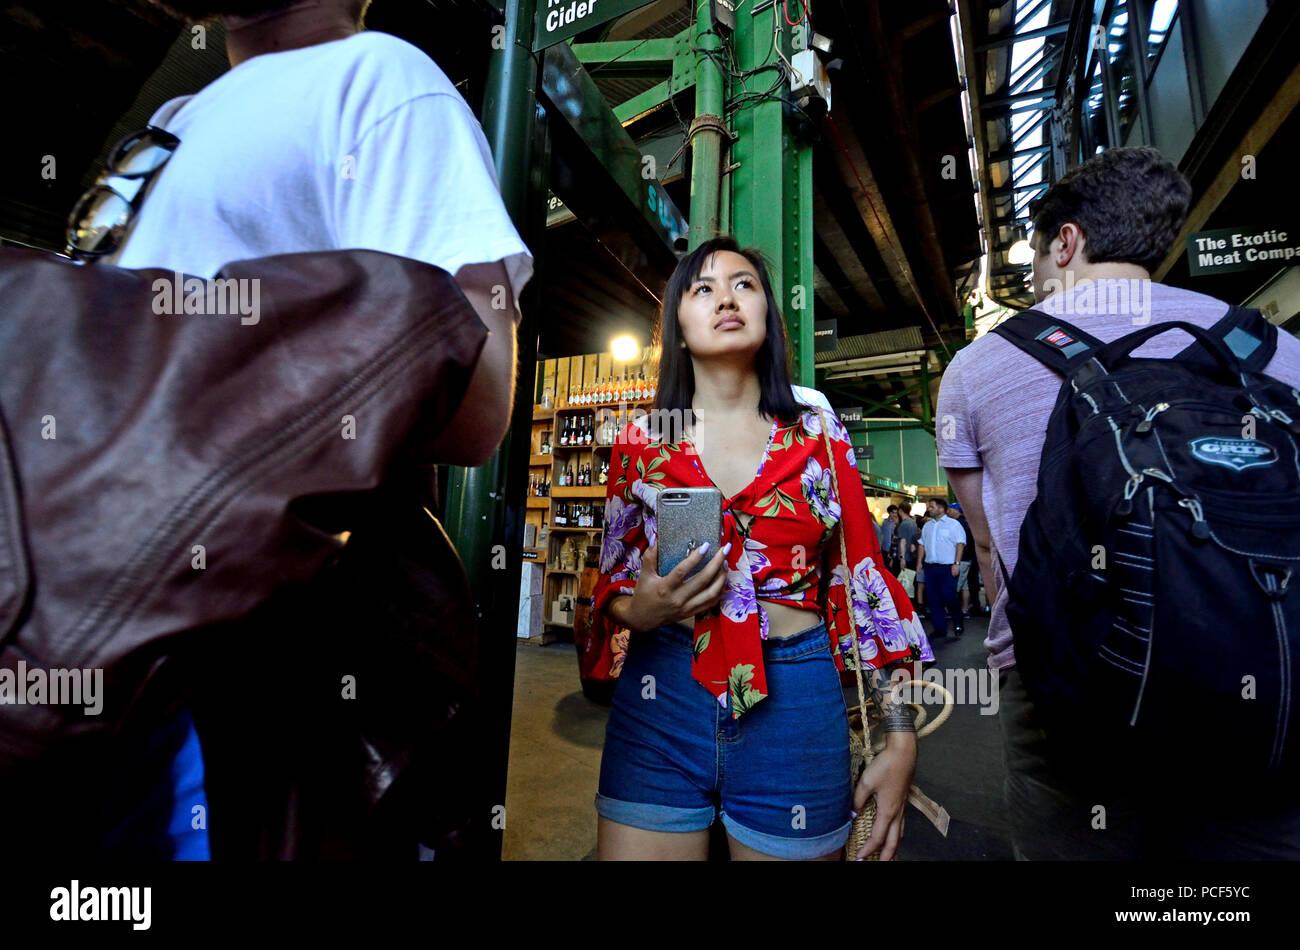 Asian tourist in a crowded Borough Market, Southwark, London, England, UK. Stock Photo